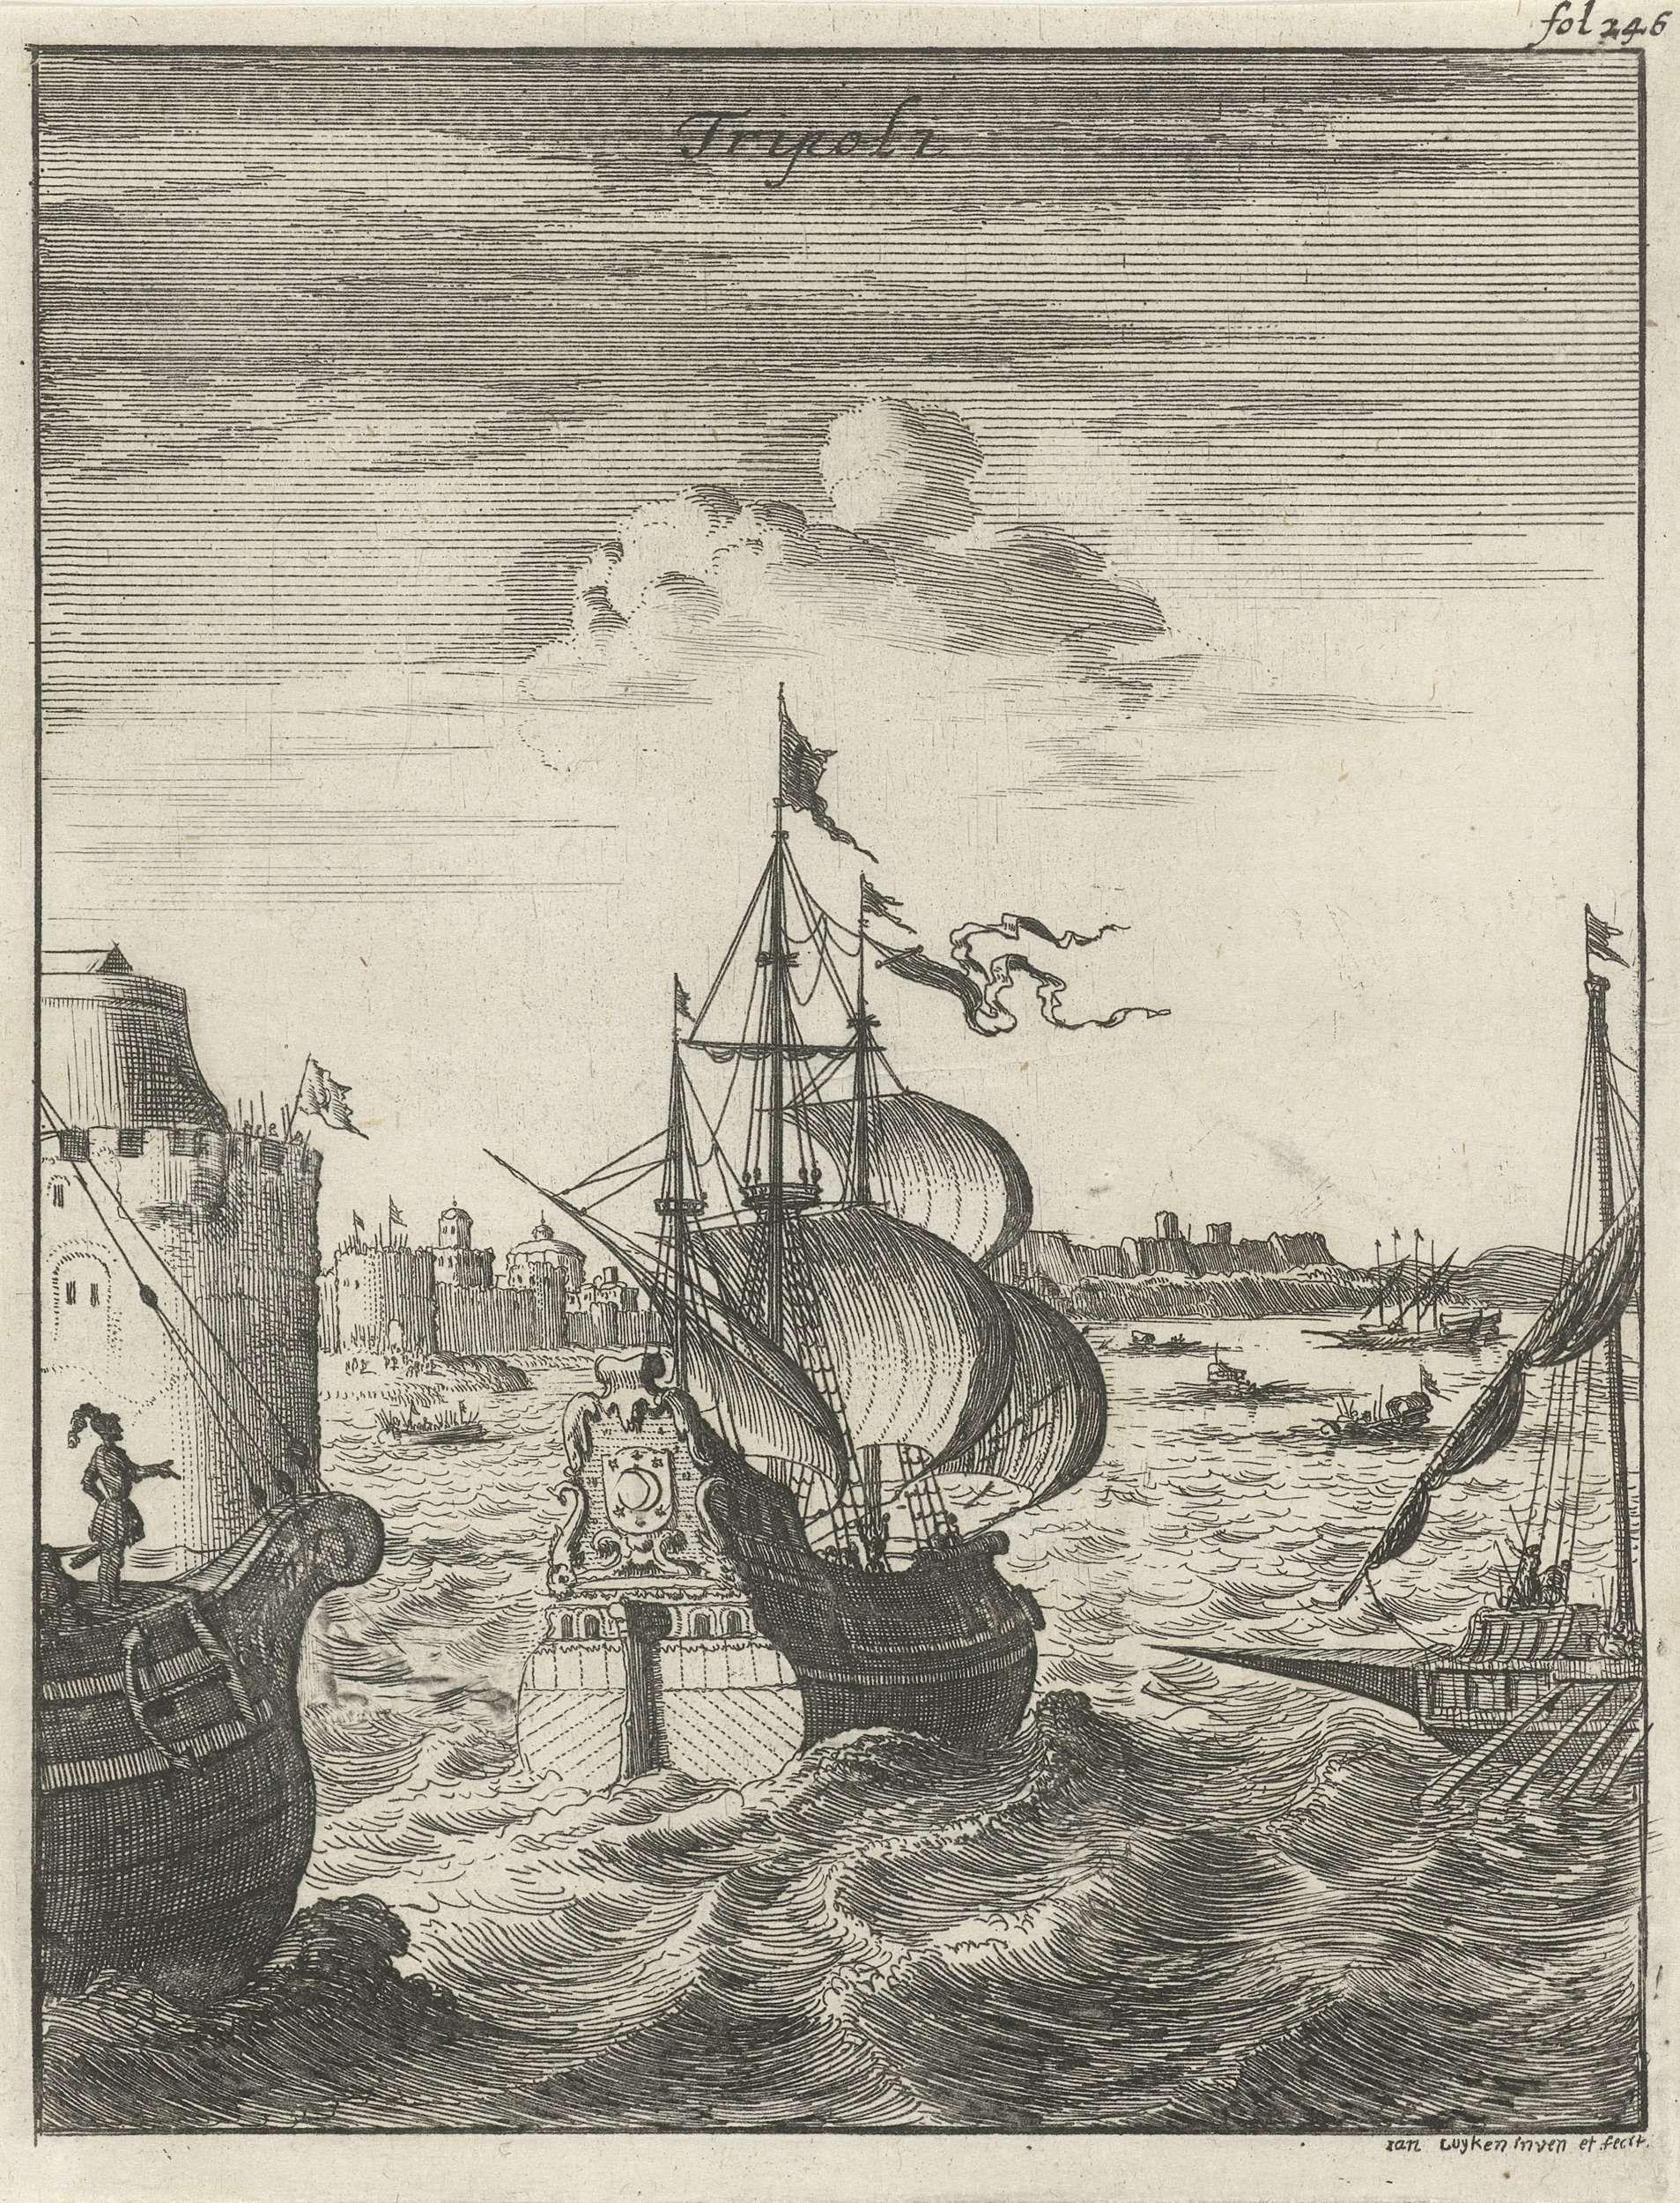 Jan Luyken | Schepen varen Tripoli binnen, Jan Luyken, 1684 | Prent rechtsboven gemerkt: fol. 246.